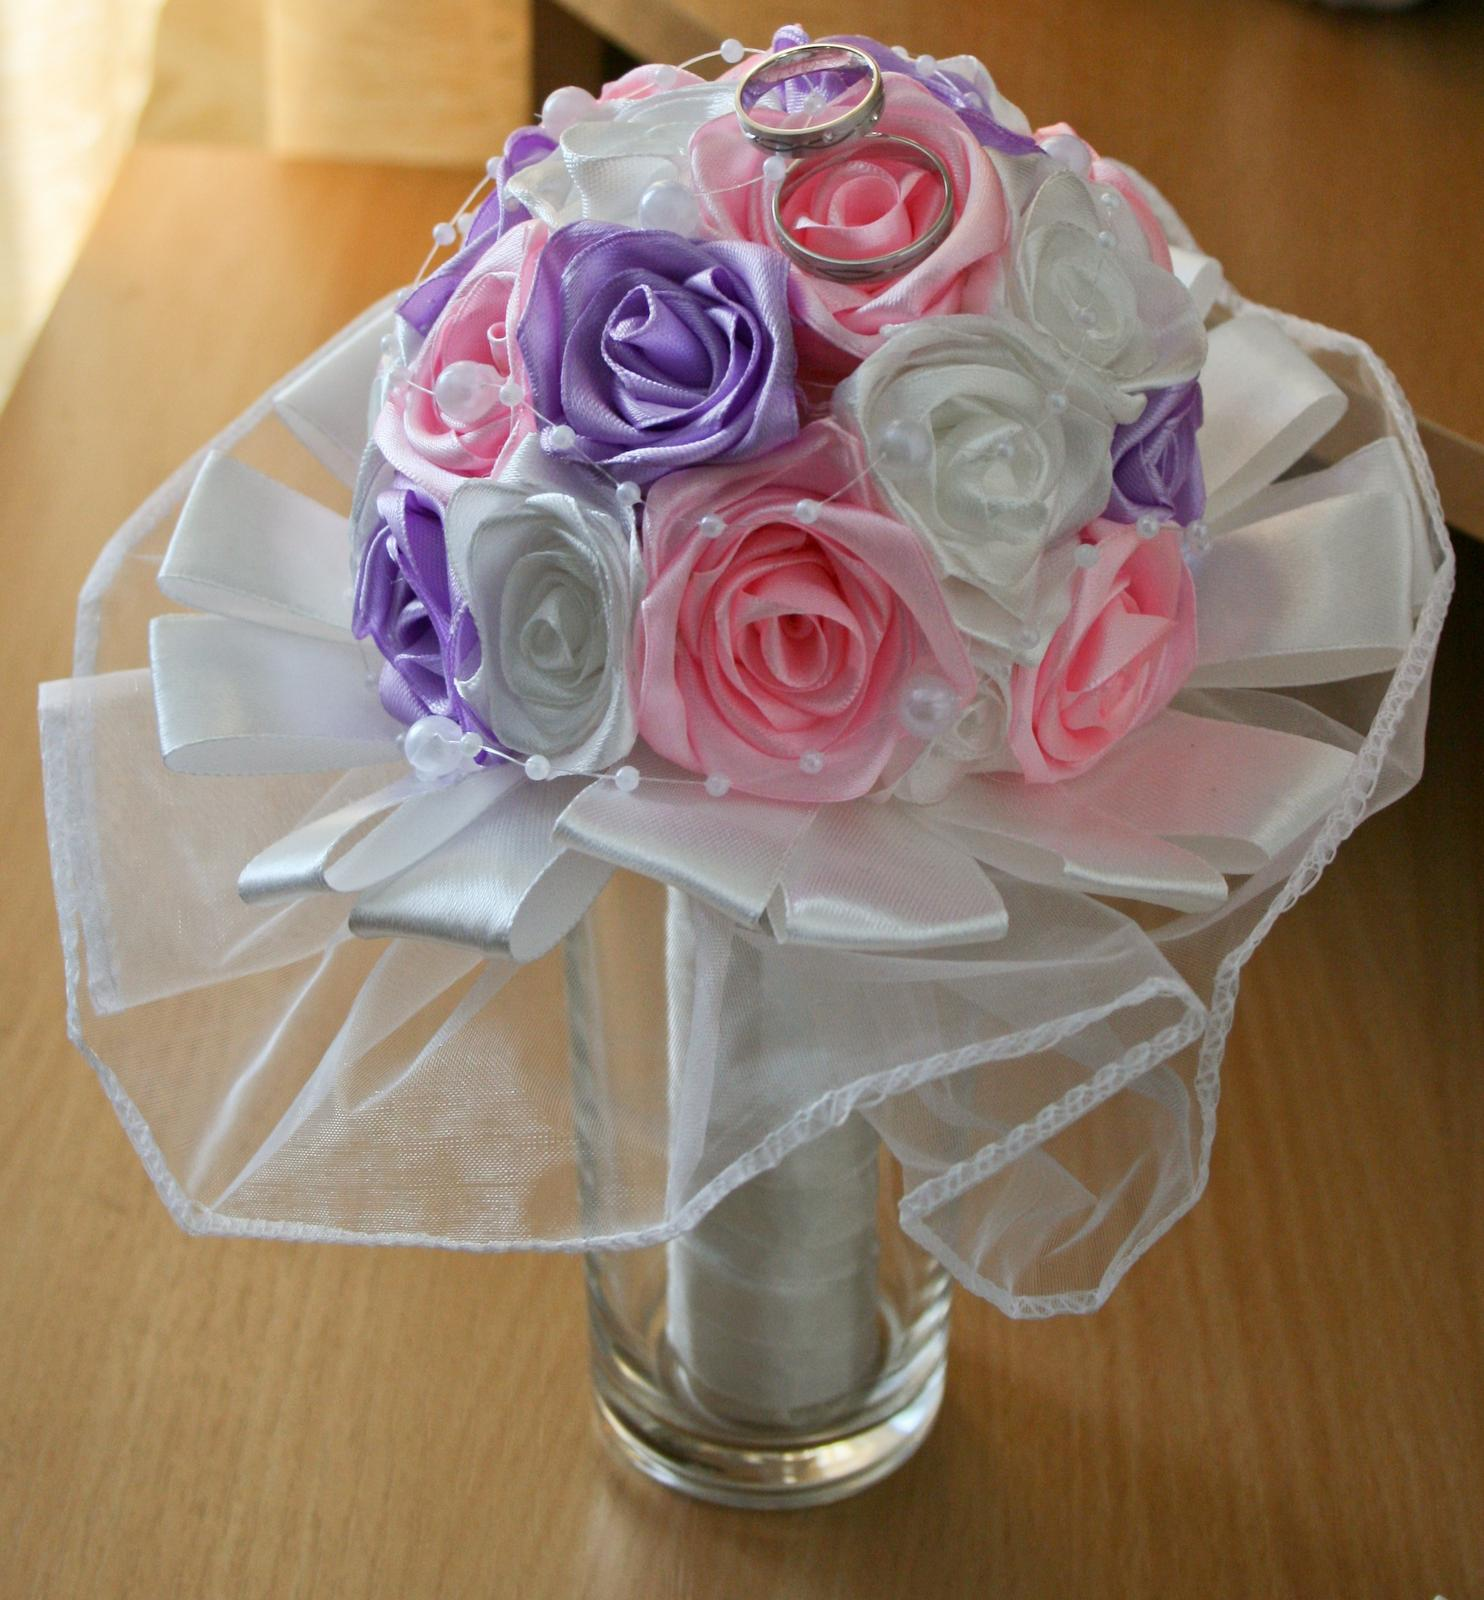 Svadobné kytice neviest z Mojej svadby - @its1mishell